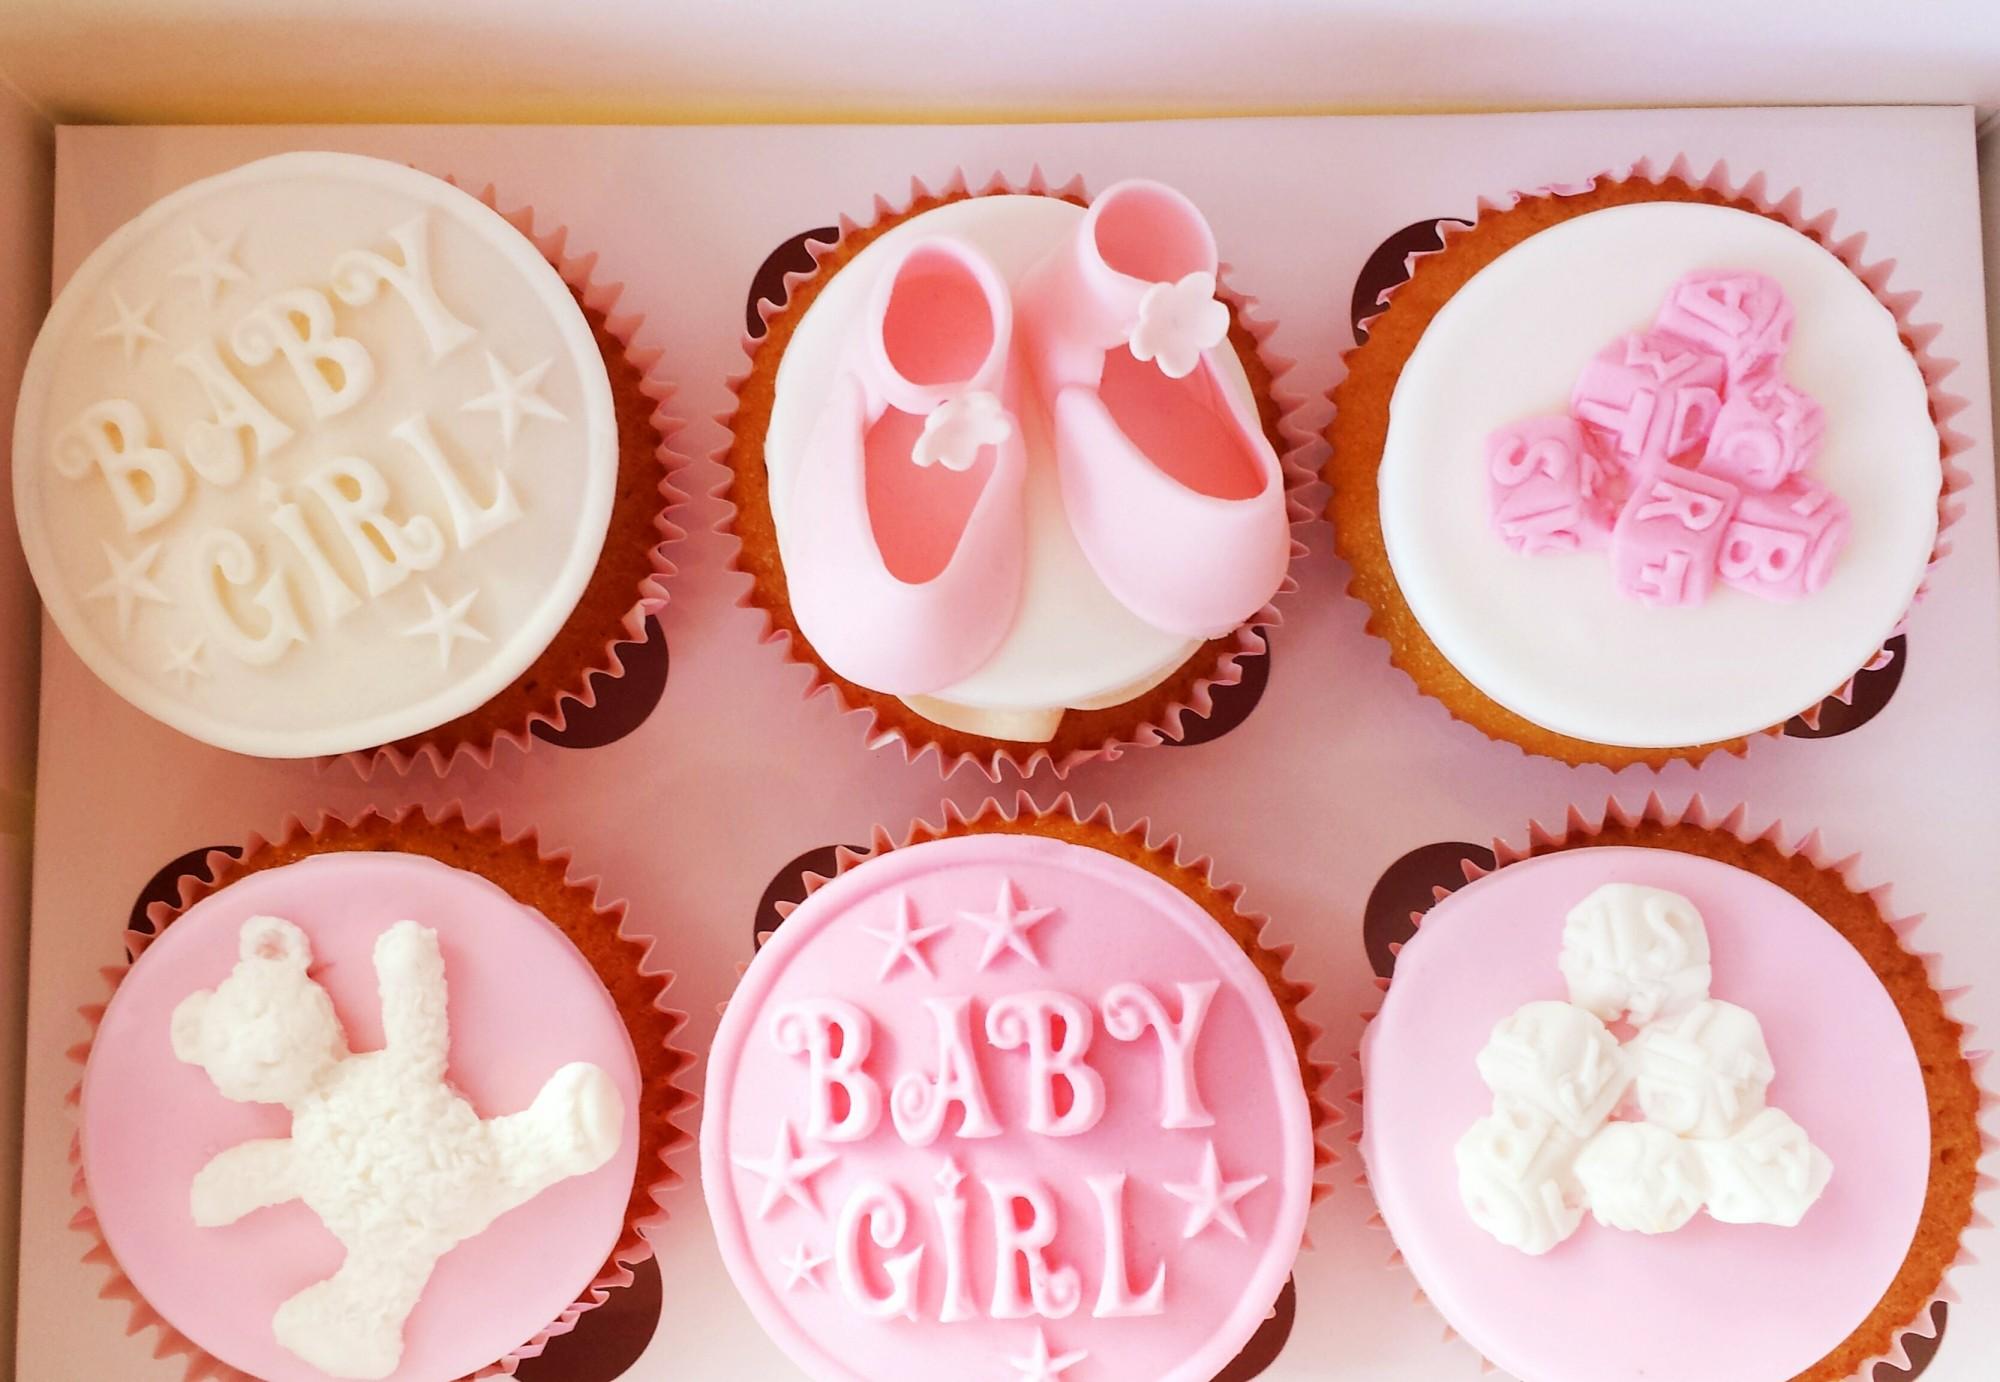 Baby-shower-cupcakes-roze, meisjes-cupcakes, roze-cupcakes